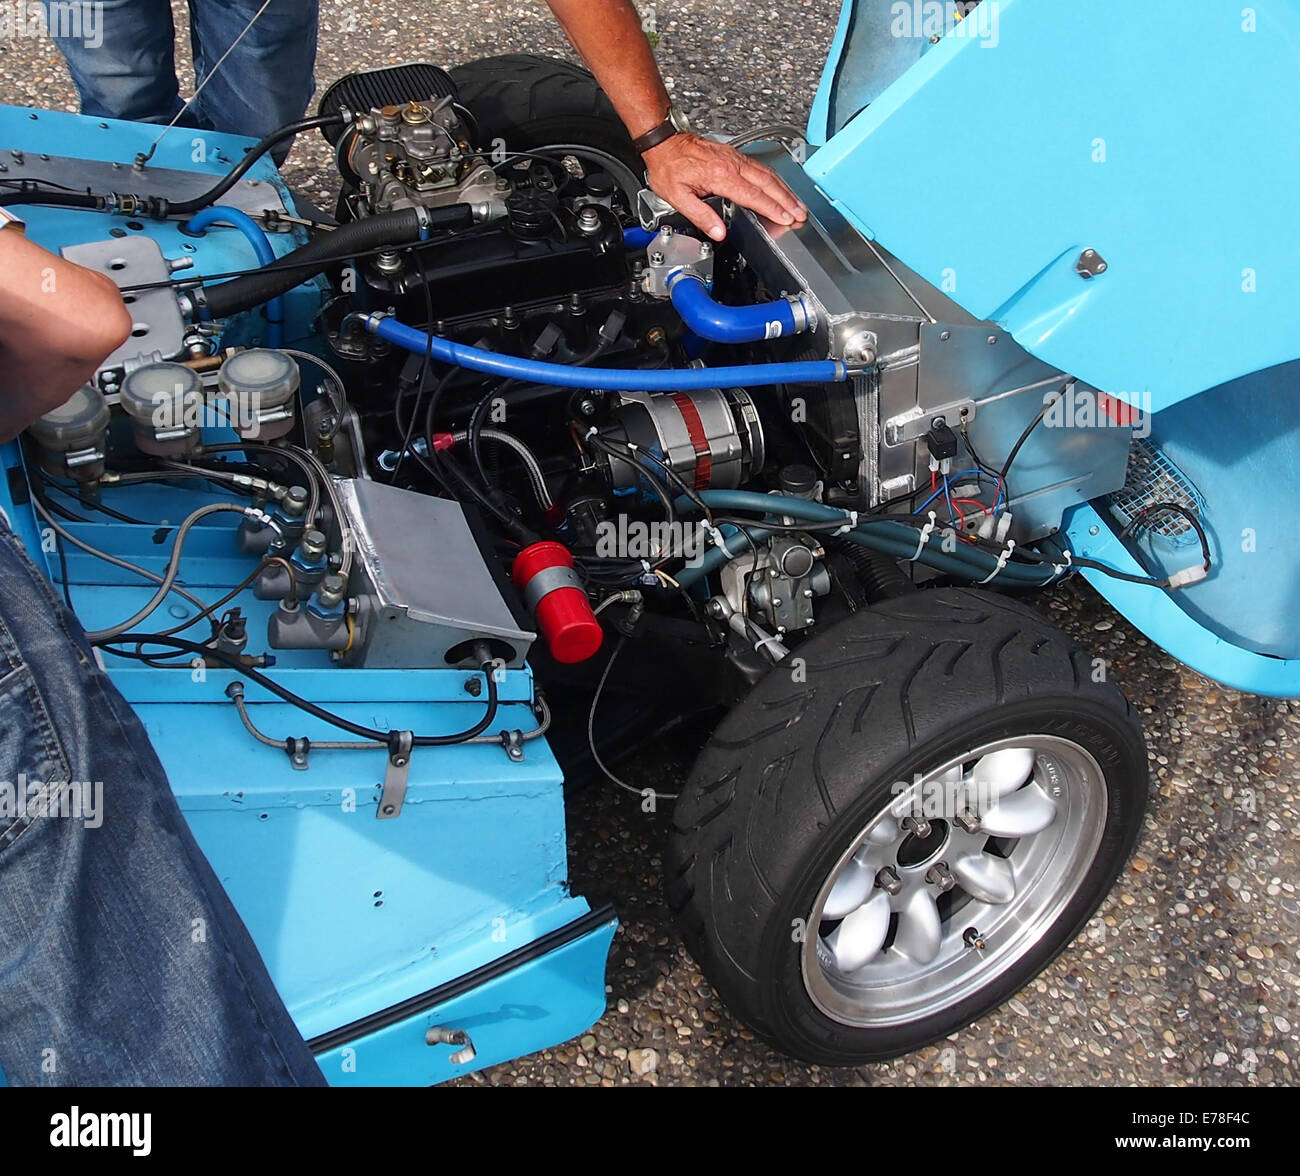 Austin Healey Sprite Monza - No52, Pieter Bakker in Zandvoort, pic7 Stockbild